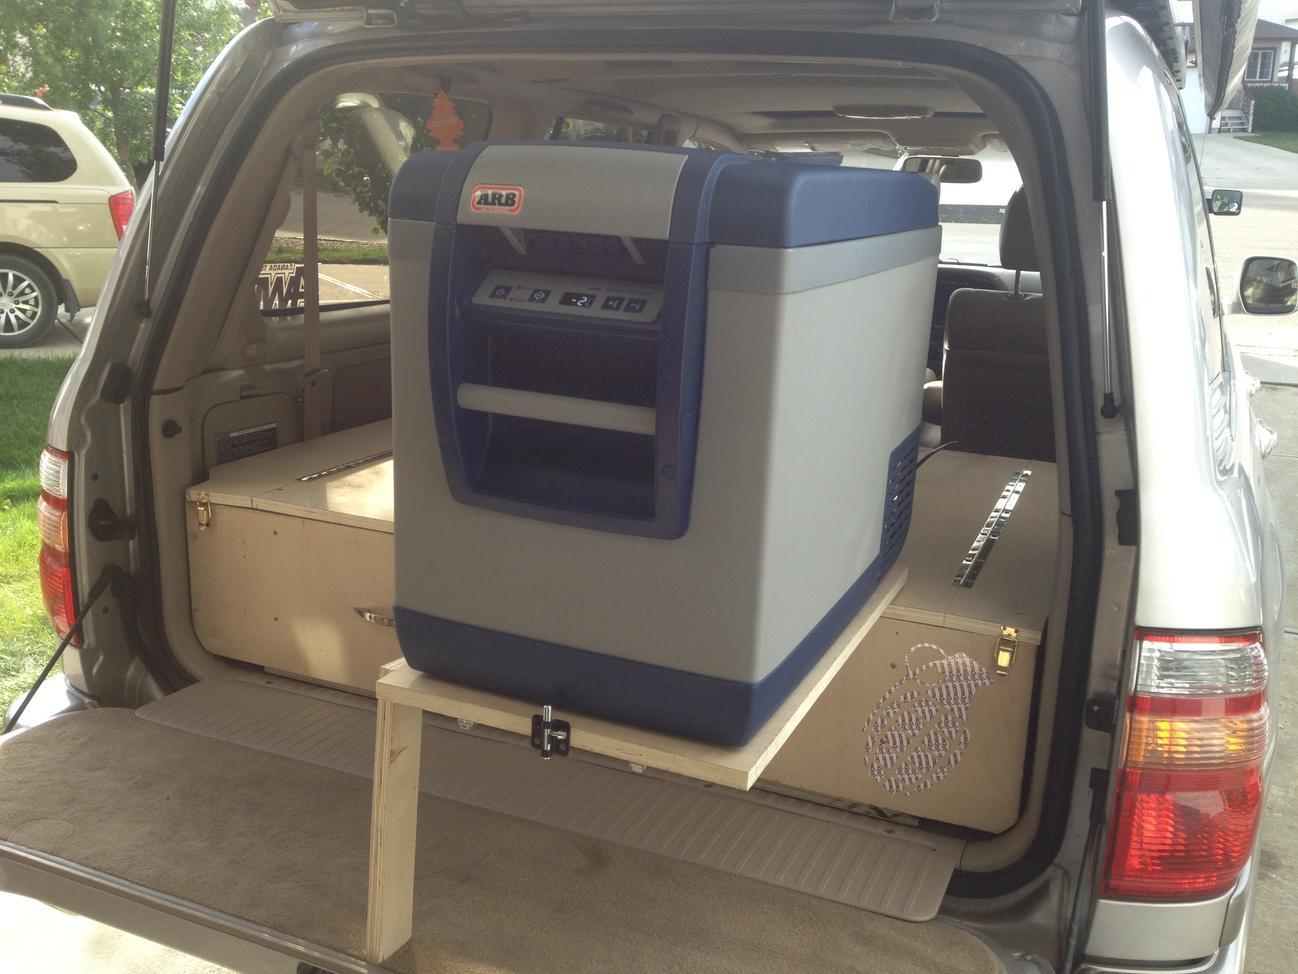 ARB fridge/freezer - Page 2 - Toyota 4Runner Forum - Largest